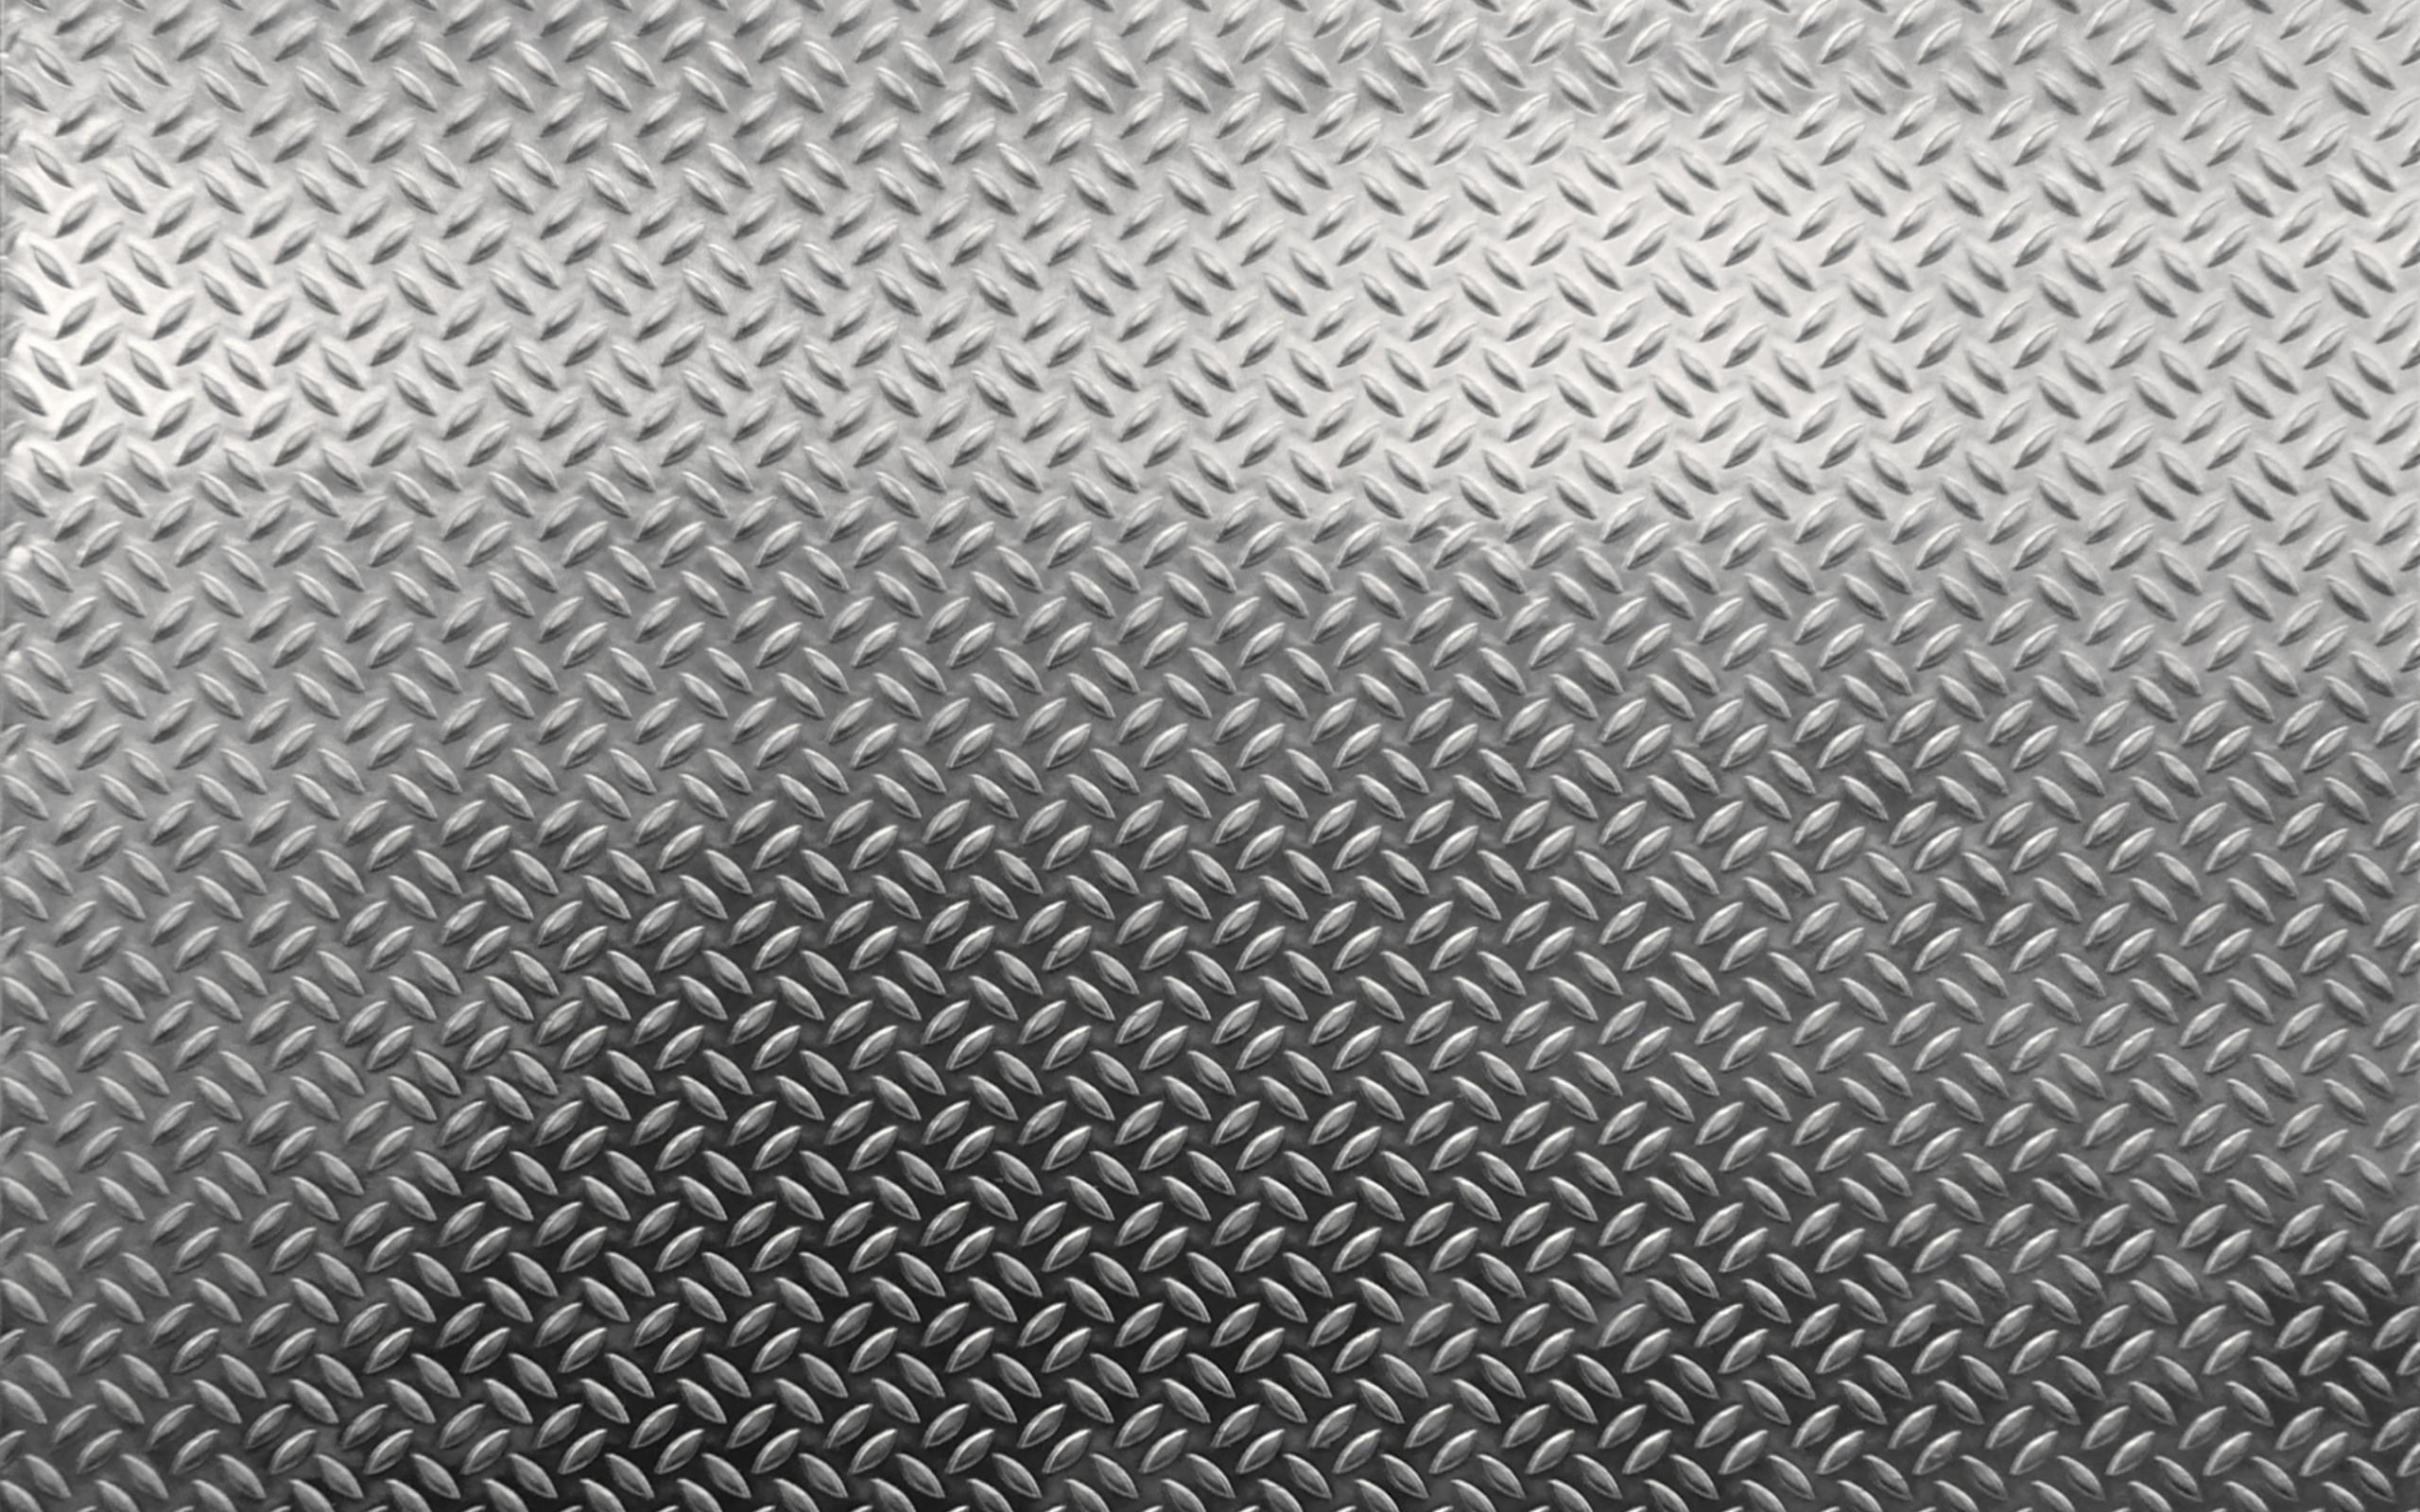 Metal Full HD Fond d'écran and Arrière-Plan | 2560x1600 | ID:369168